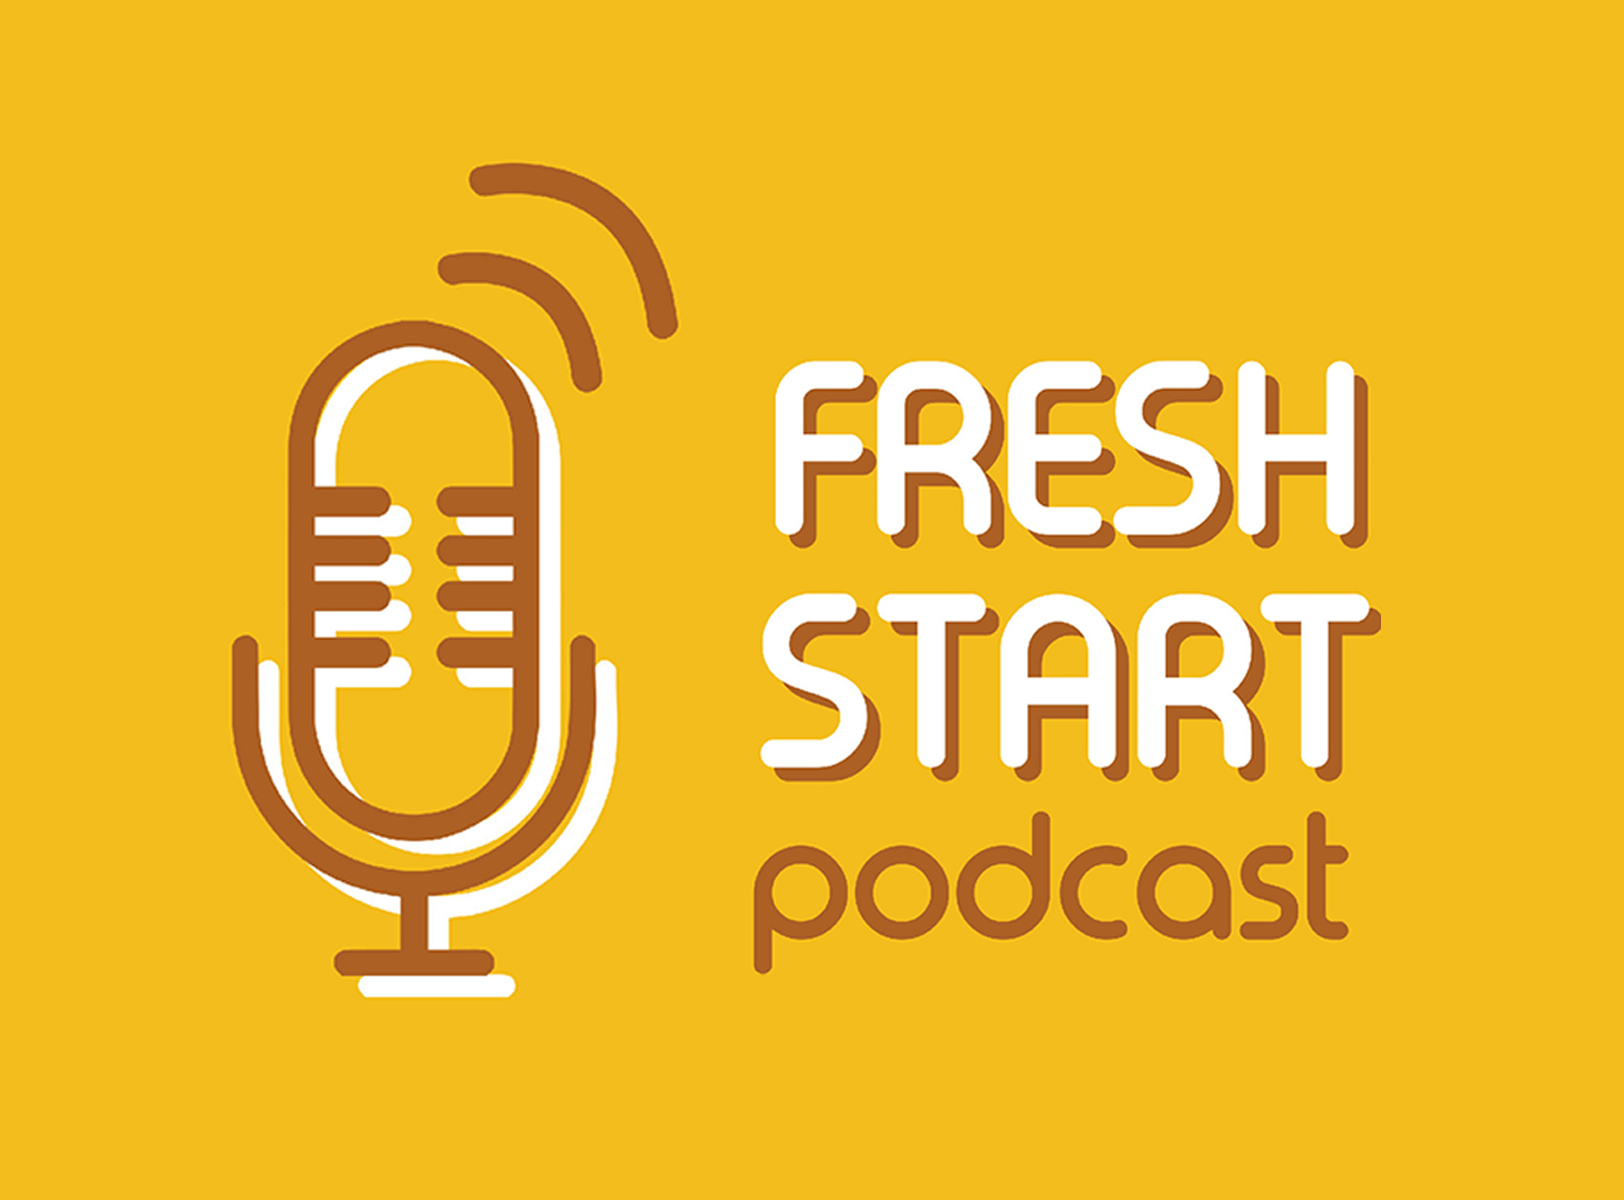 Fresh Start: Podcast News (11/13/2018 Tue.)